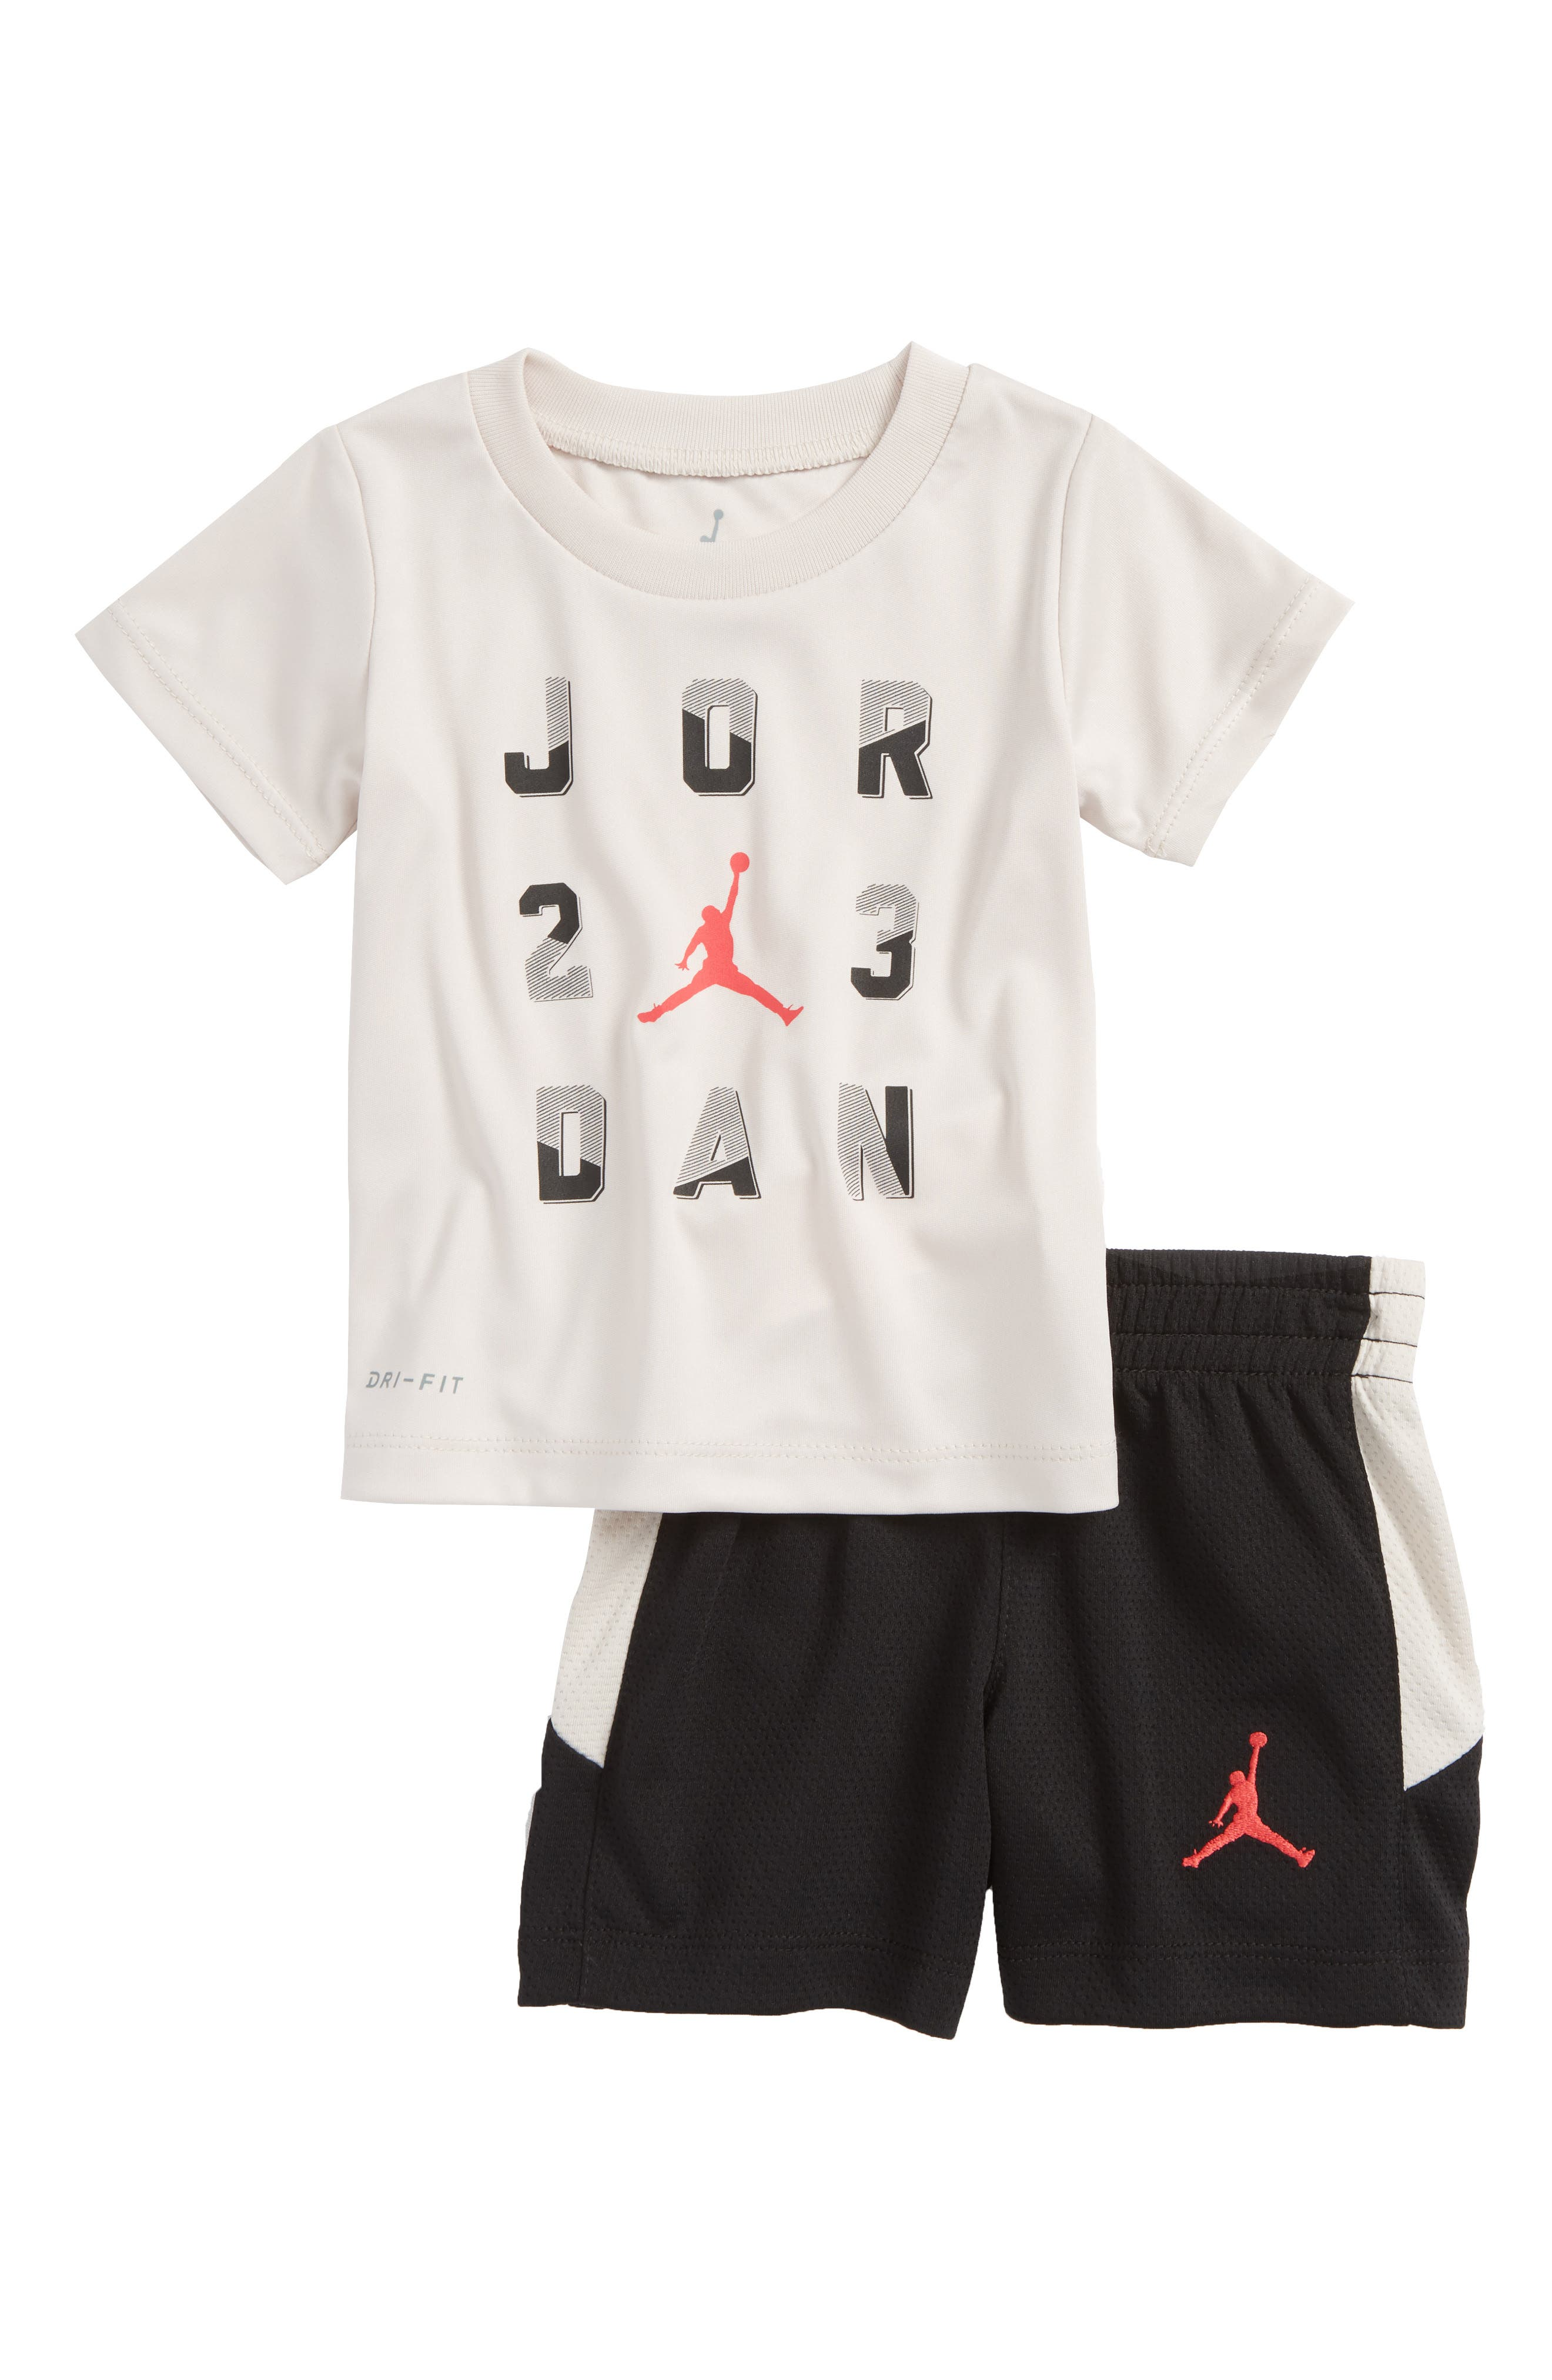 Main Image - Jordan 23 T-Shirt & Shorts Set (Baby Boys)